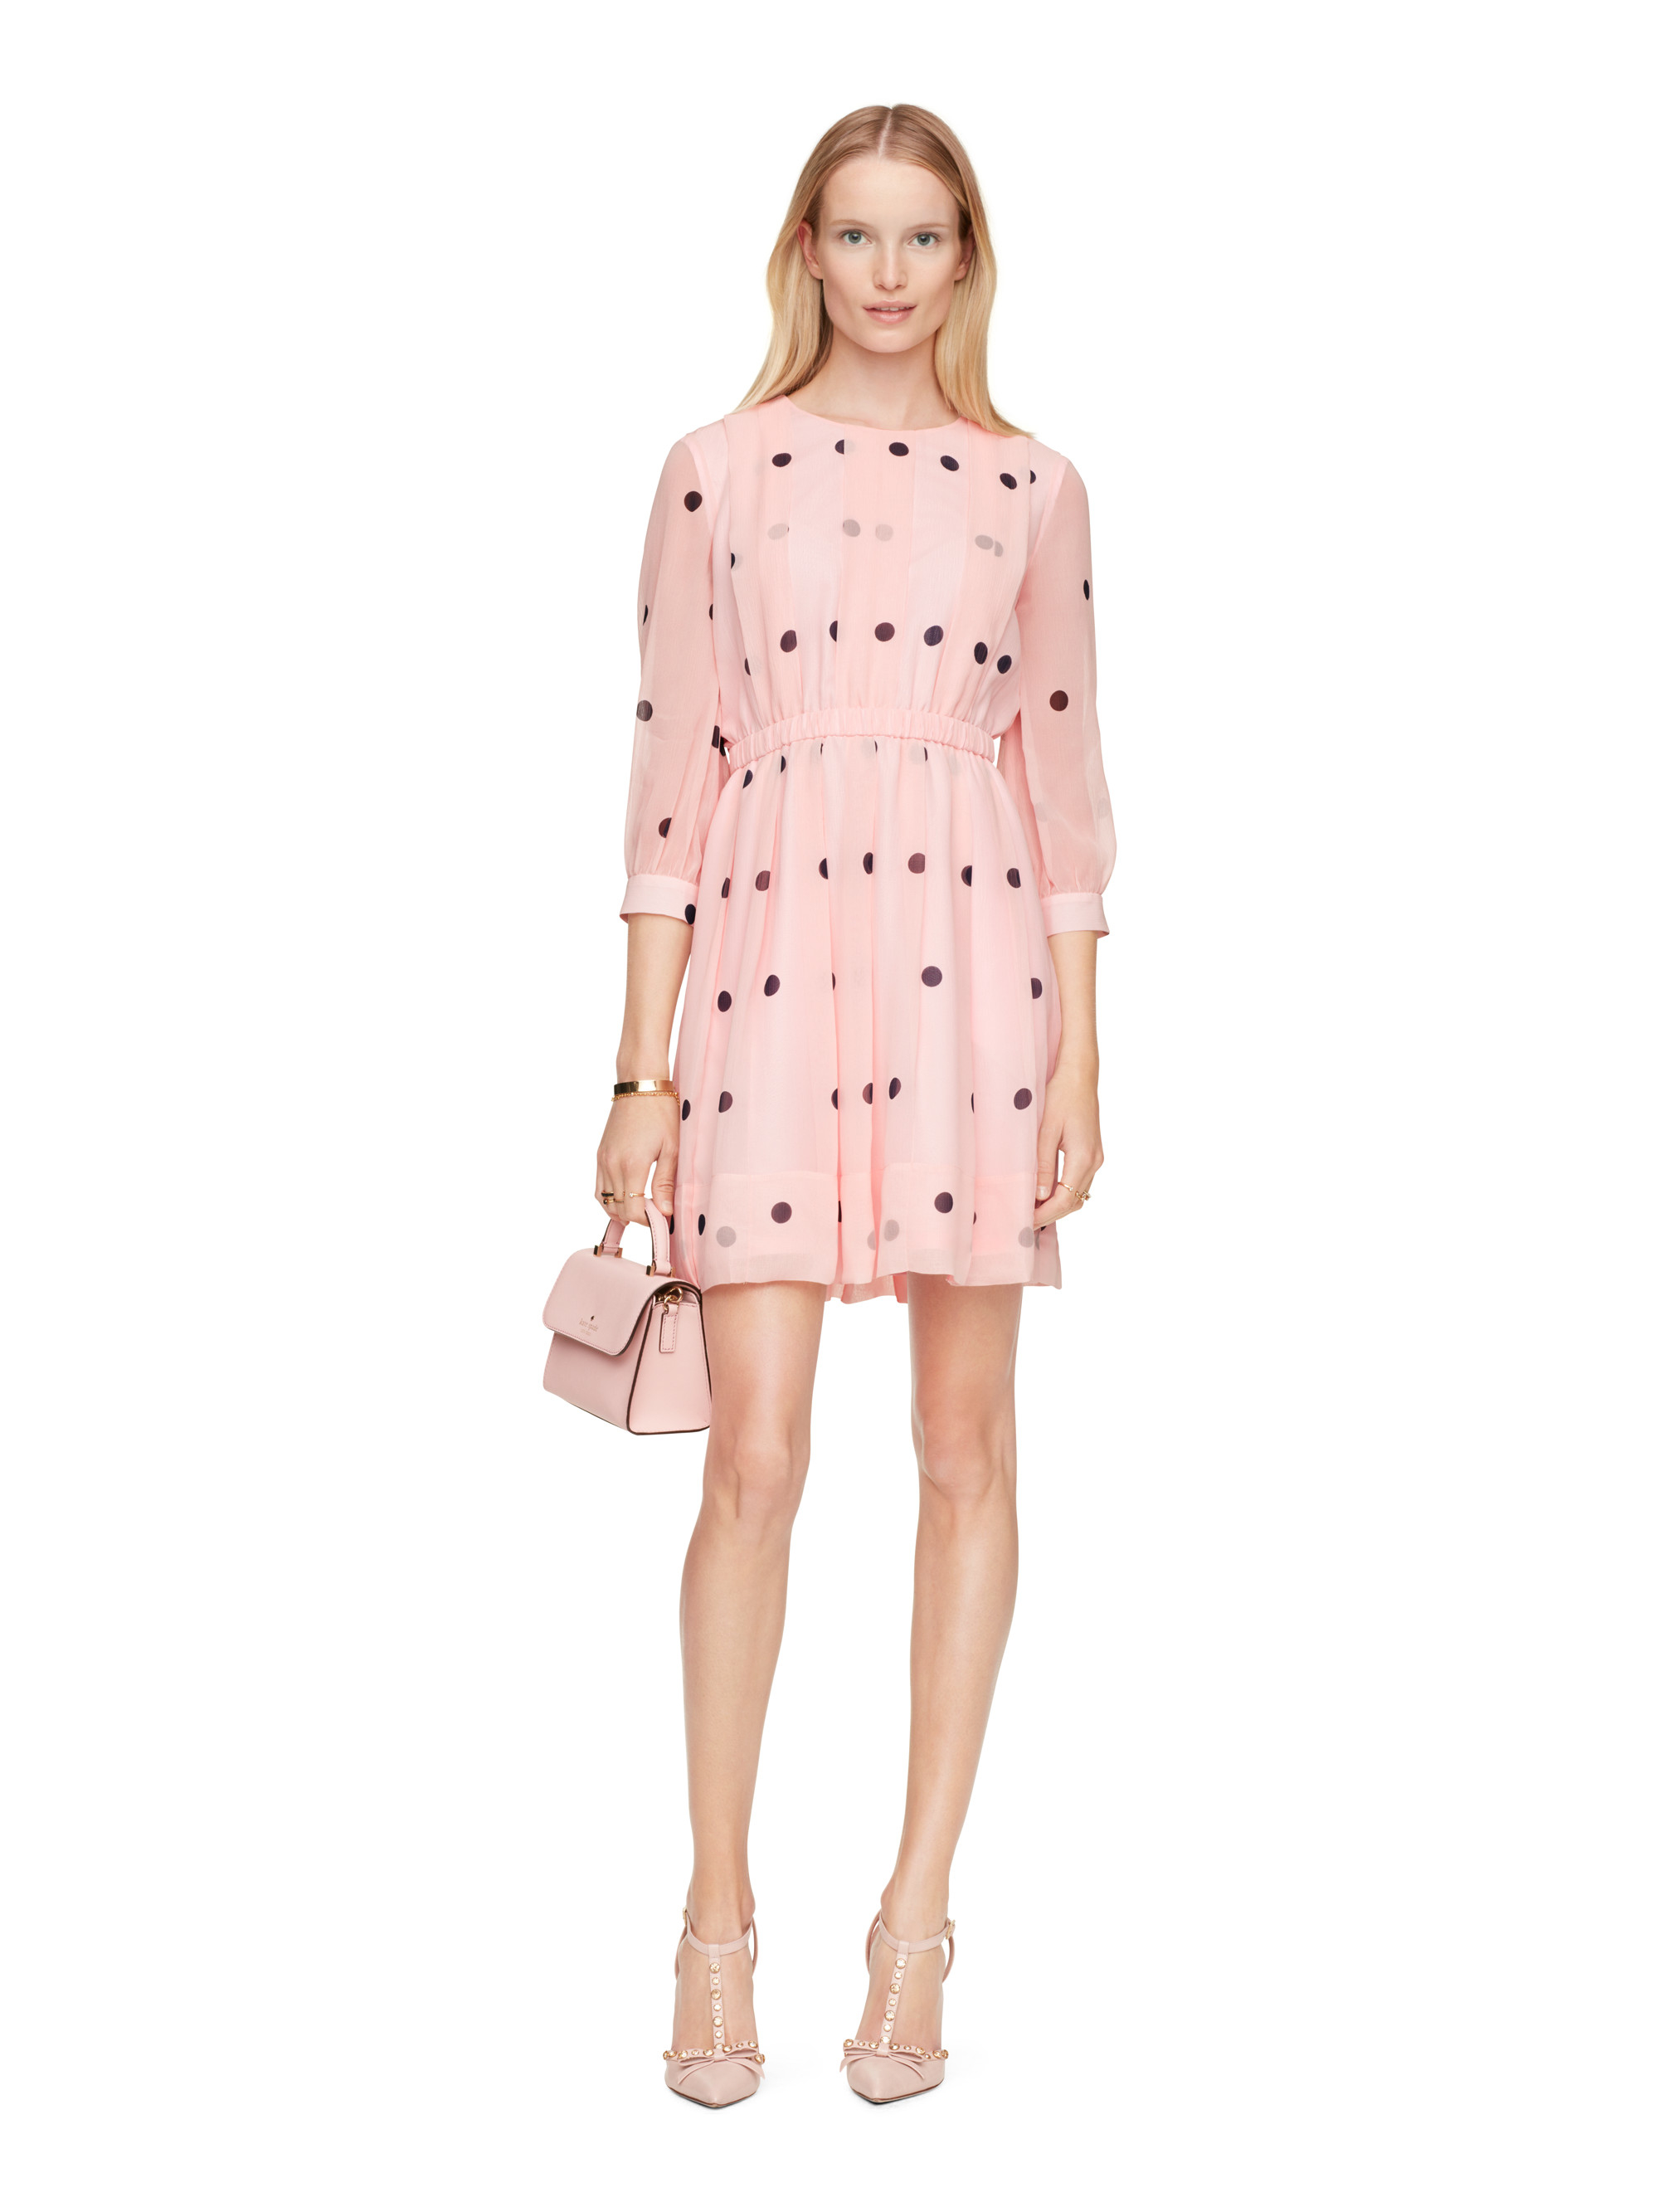 Lyst Kate Spade New York Tiny Spotlight Pleated Dress In